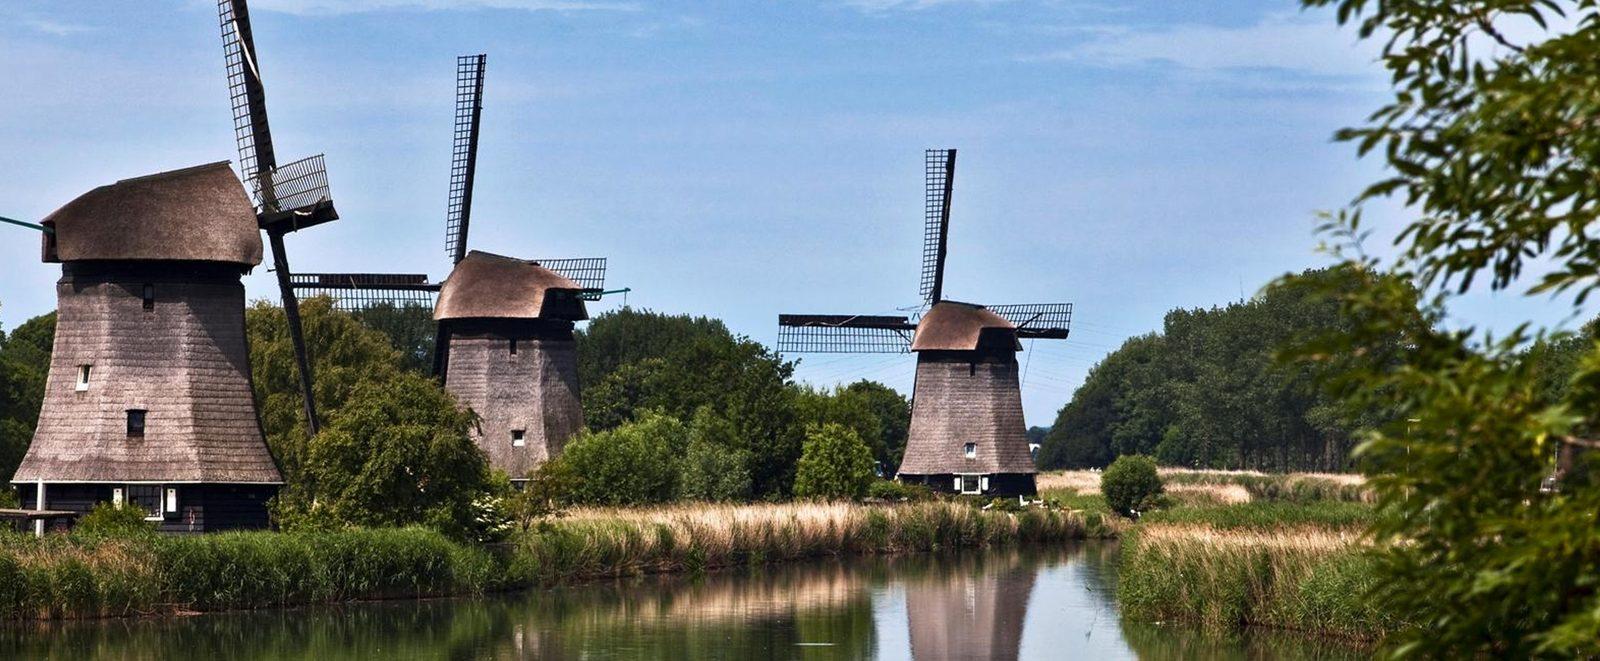 Ferienhäuser in Nordholland